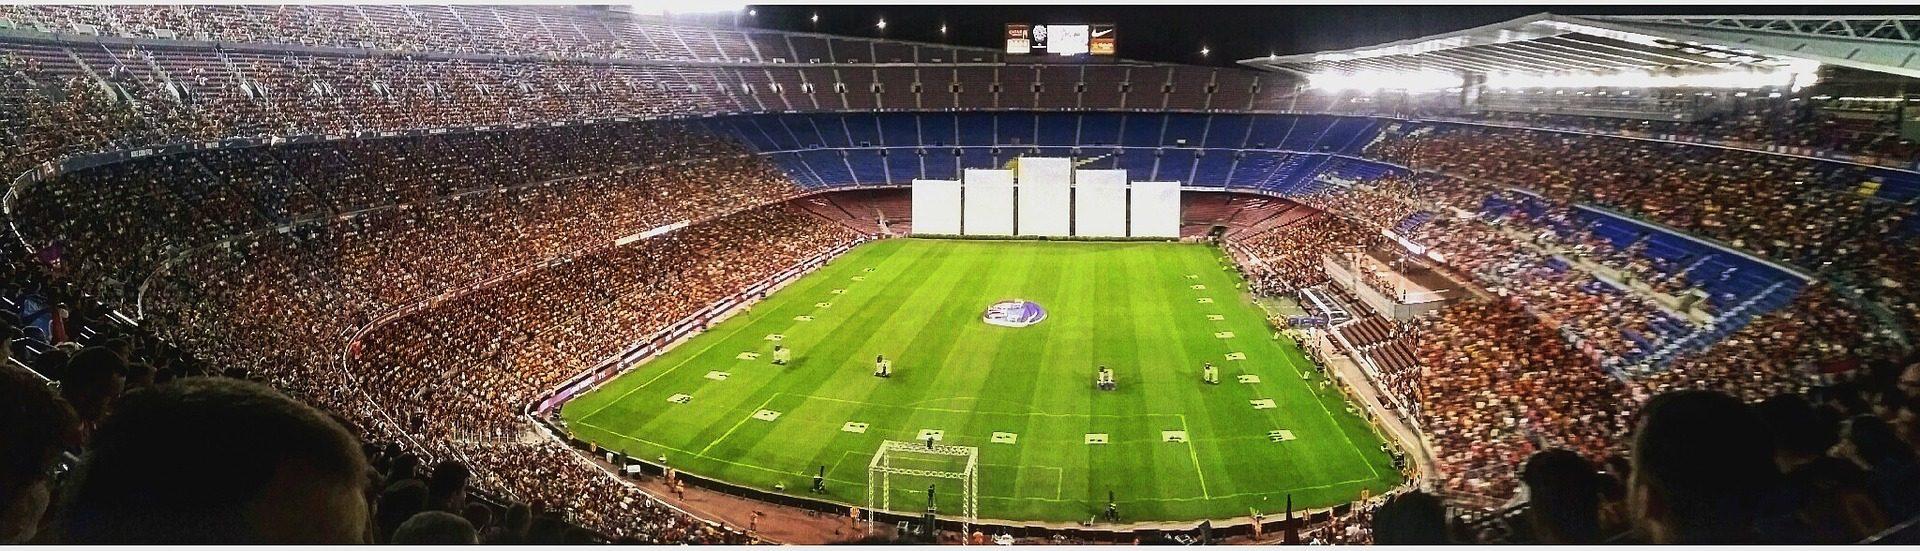 La Liga Barcelona Tickets günstig ab 48,00€ - Städtetrip 117,00€ Flug & Hotel